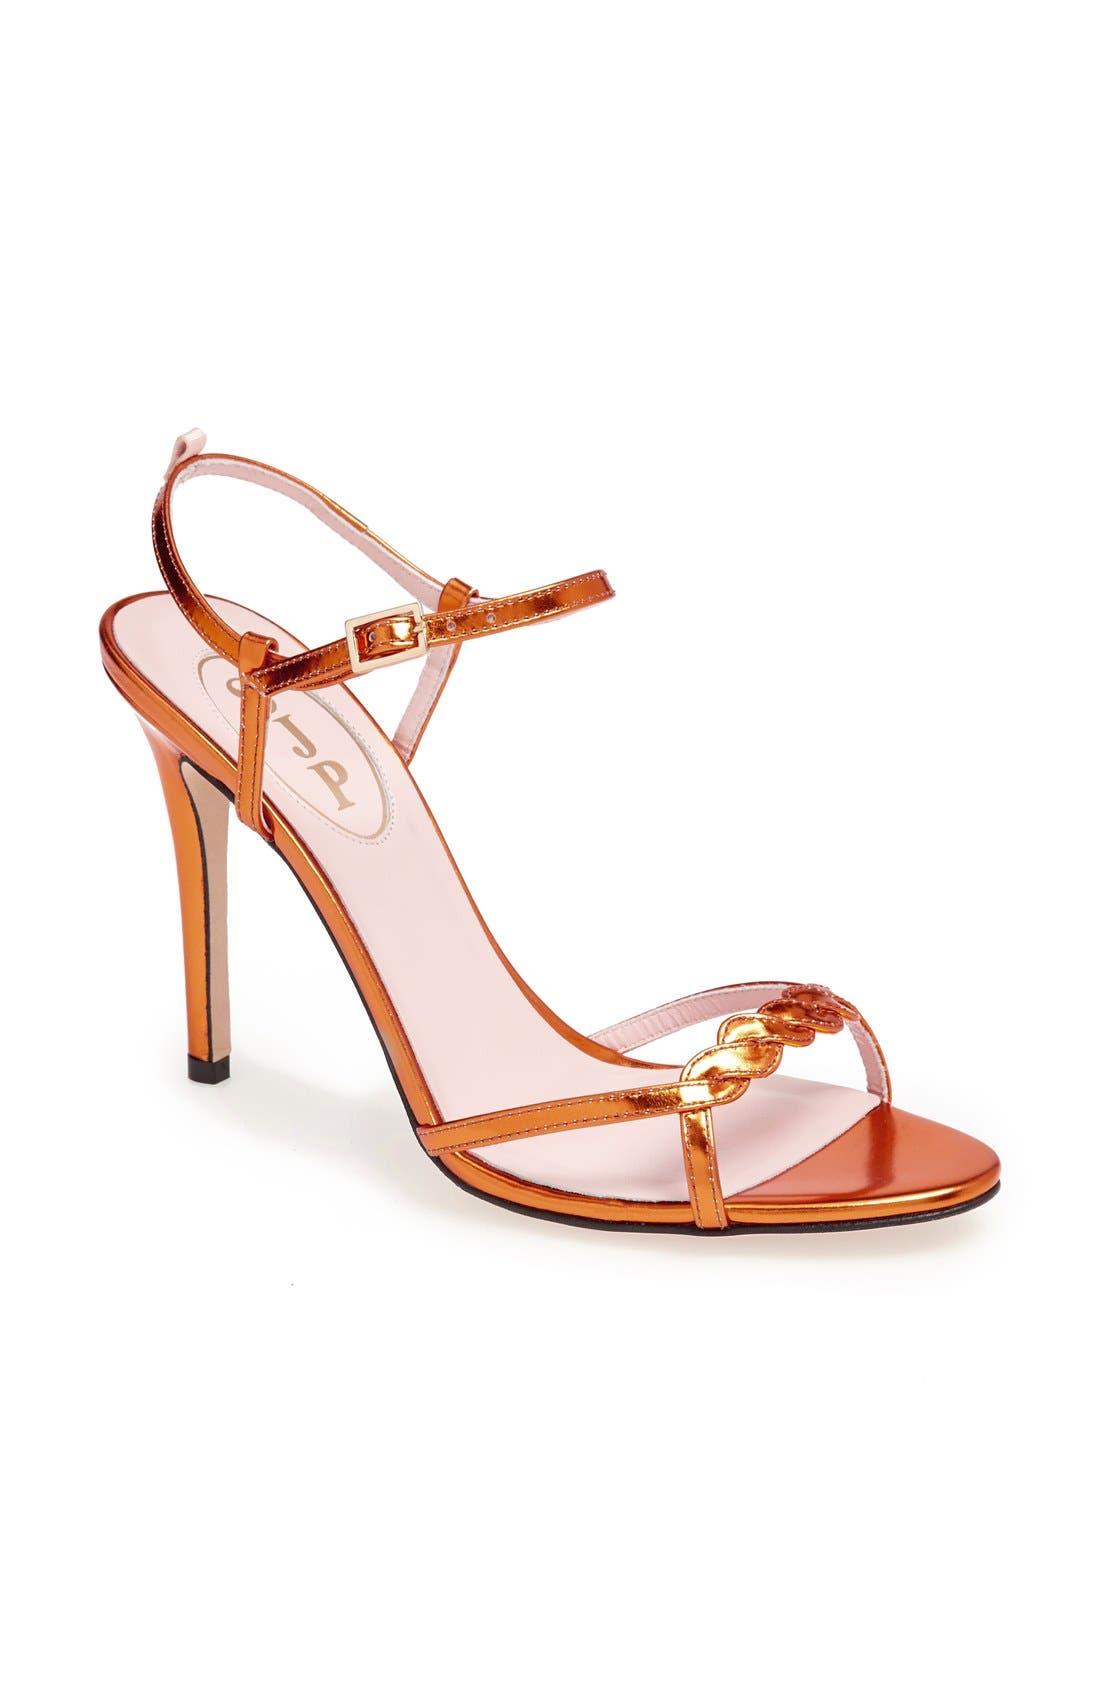 Main Image - SJP 'Brigitte' Sandal (Nordstrom Exclusive)